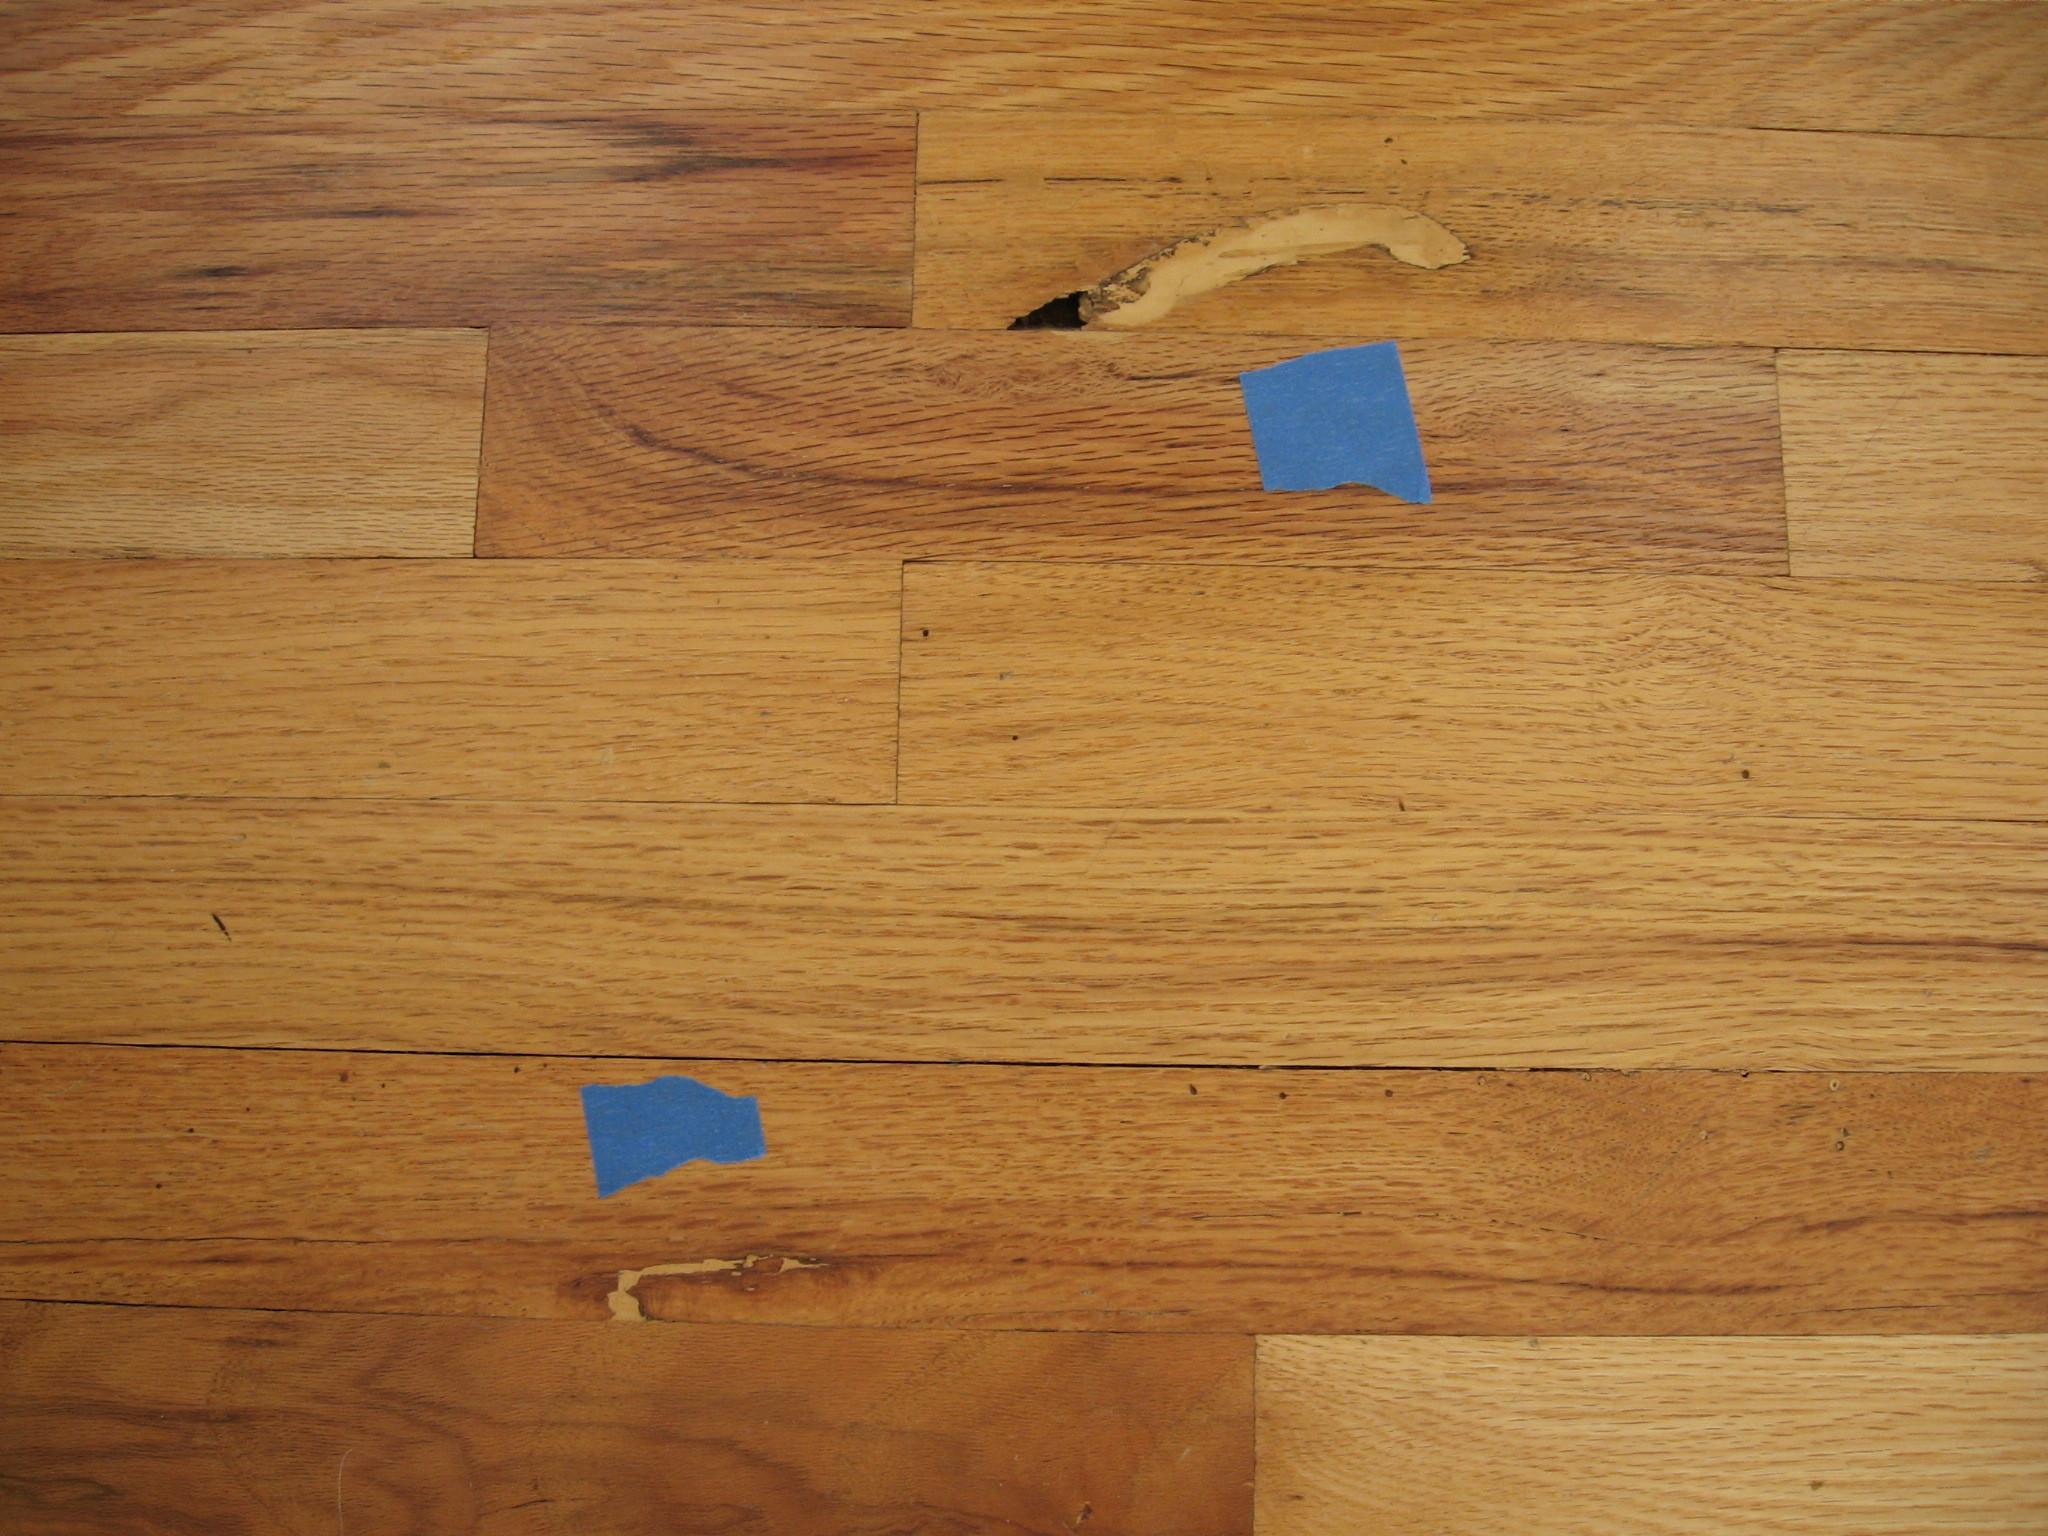 27 Trendy White Oak Hardwood Flooring Finished 2021 free download white oak hardwood flooring finished of wood floor techniques 101 for filler bad